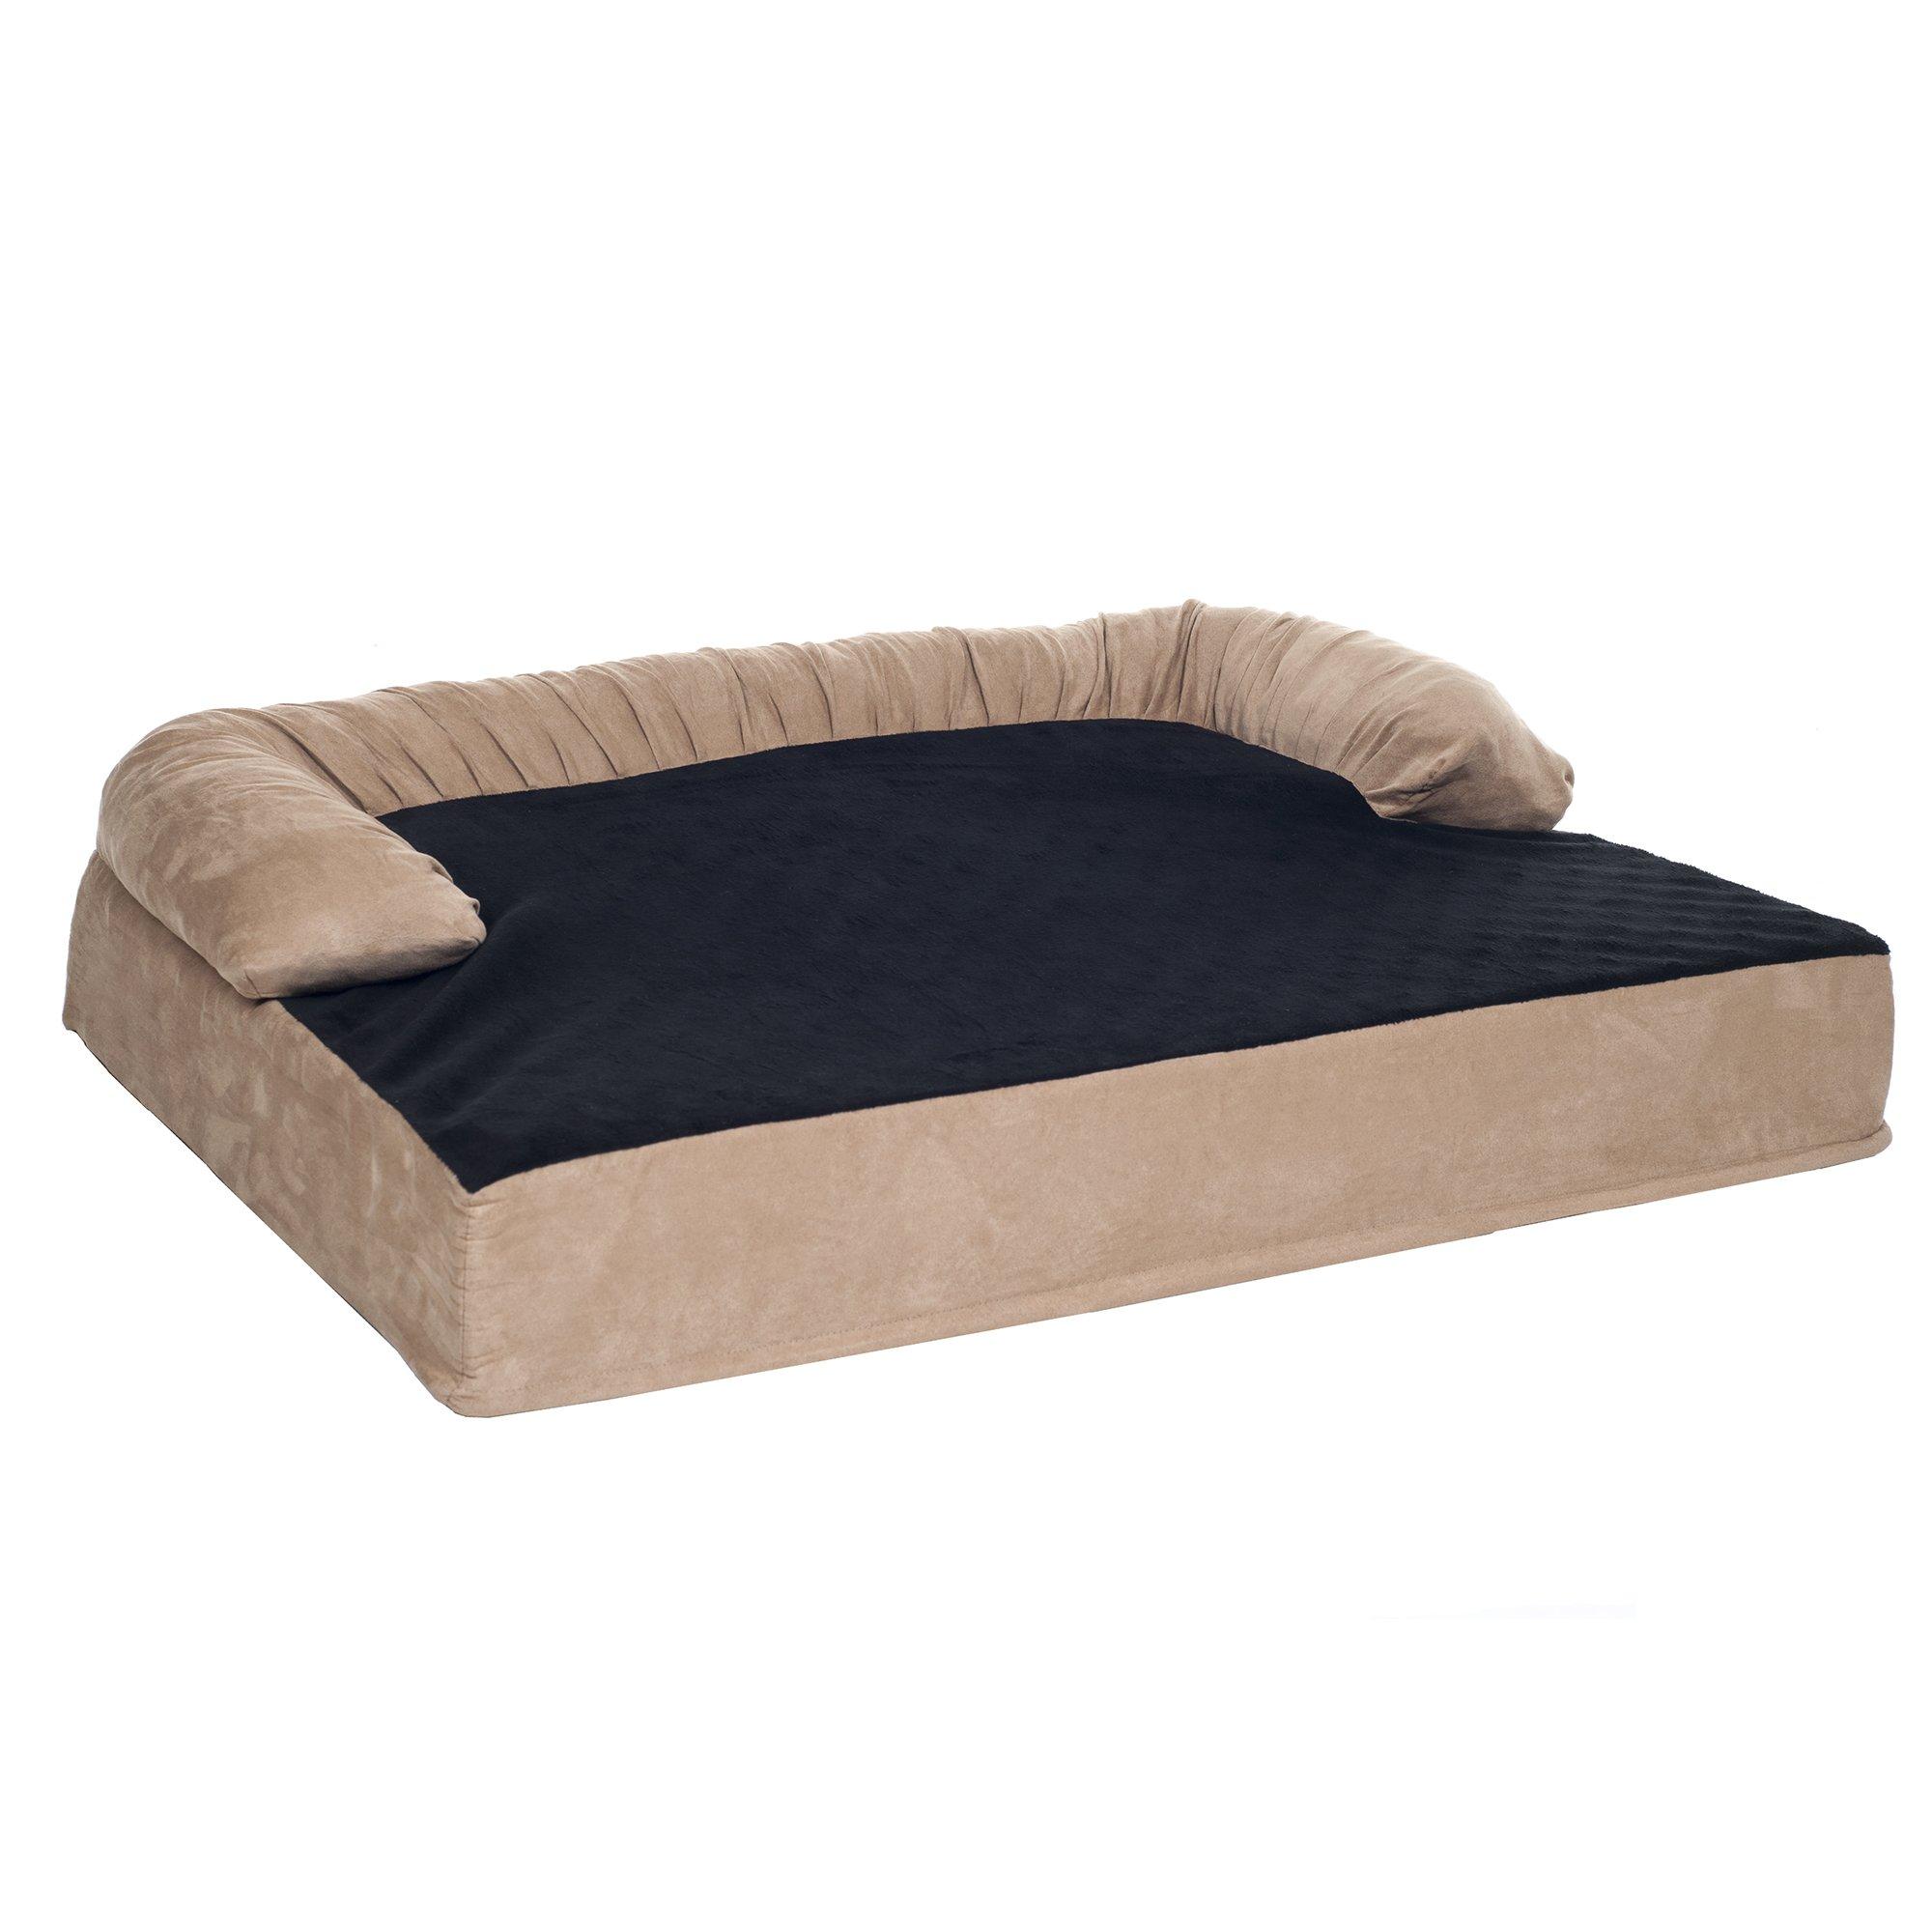 PETMAKER Orthopedic Memory Foam Pet Bed, Large